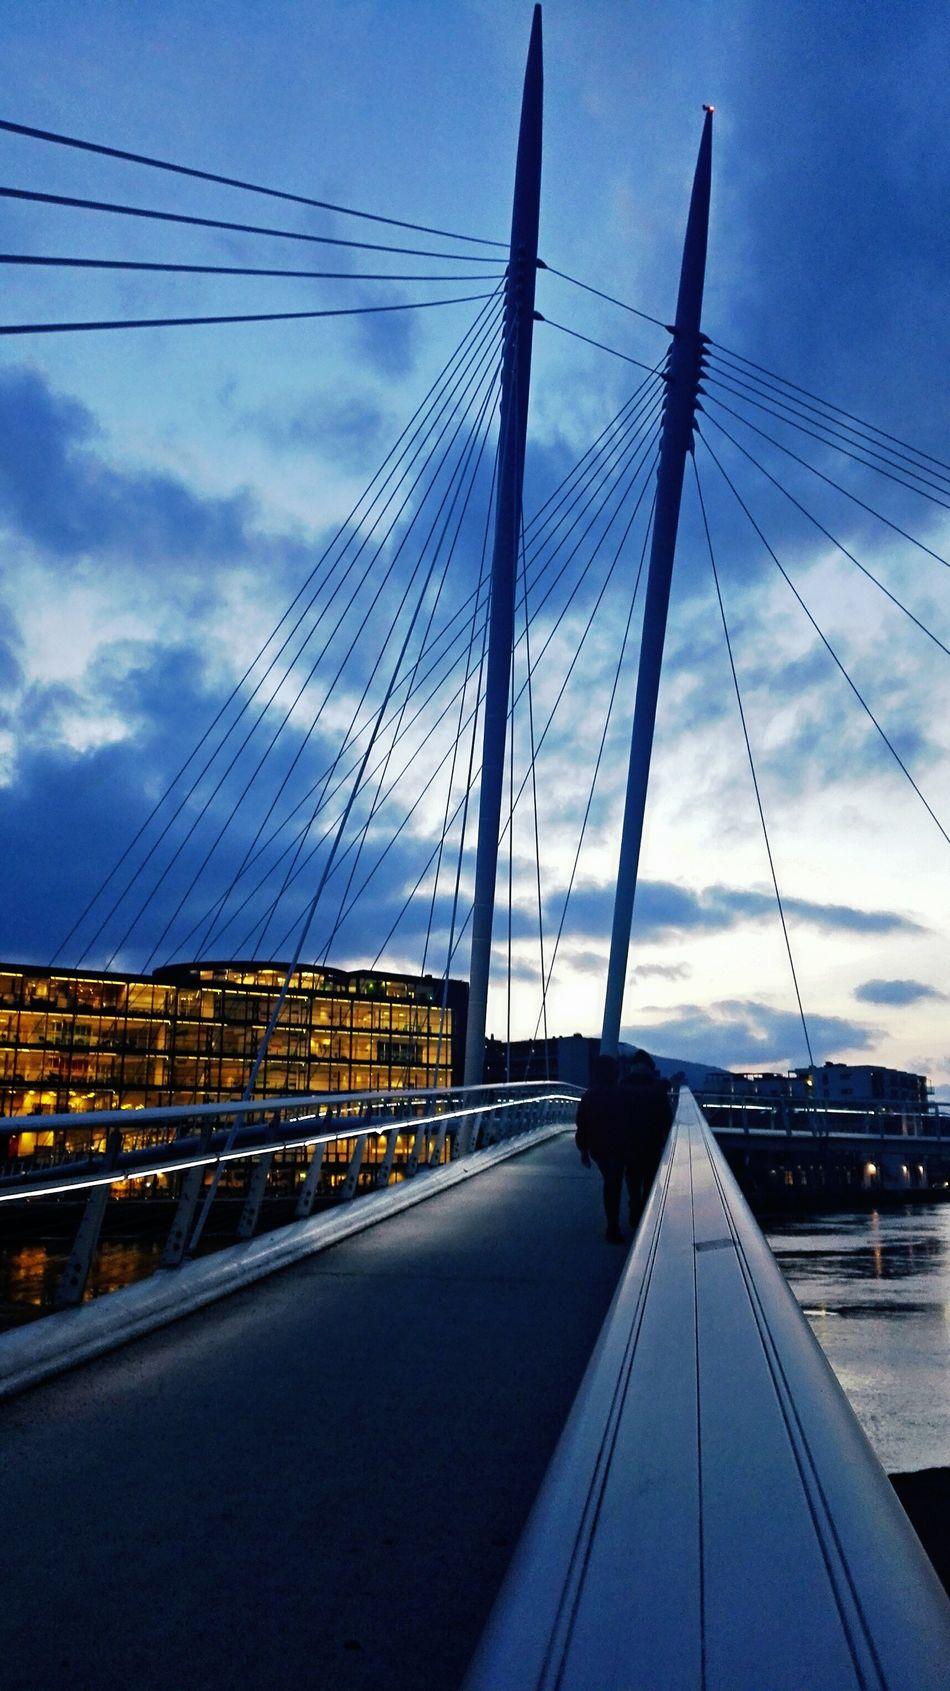 Drammen library, The Ypsylon bridge Taking PhotosNorway Hello World